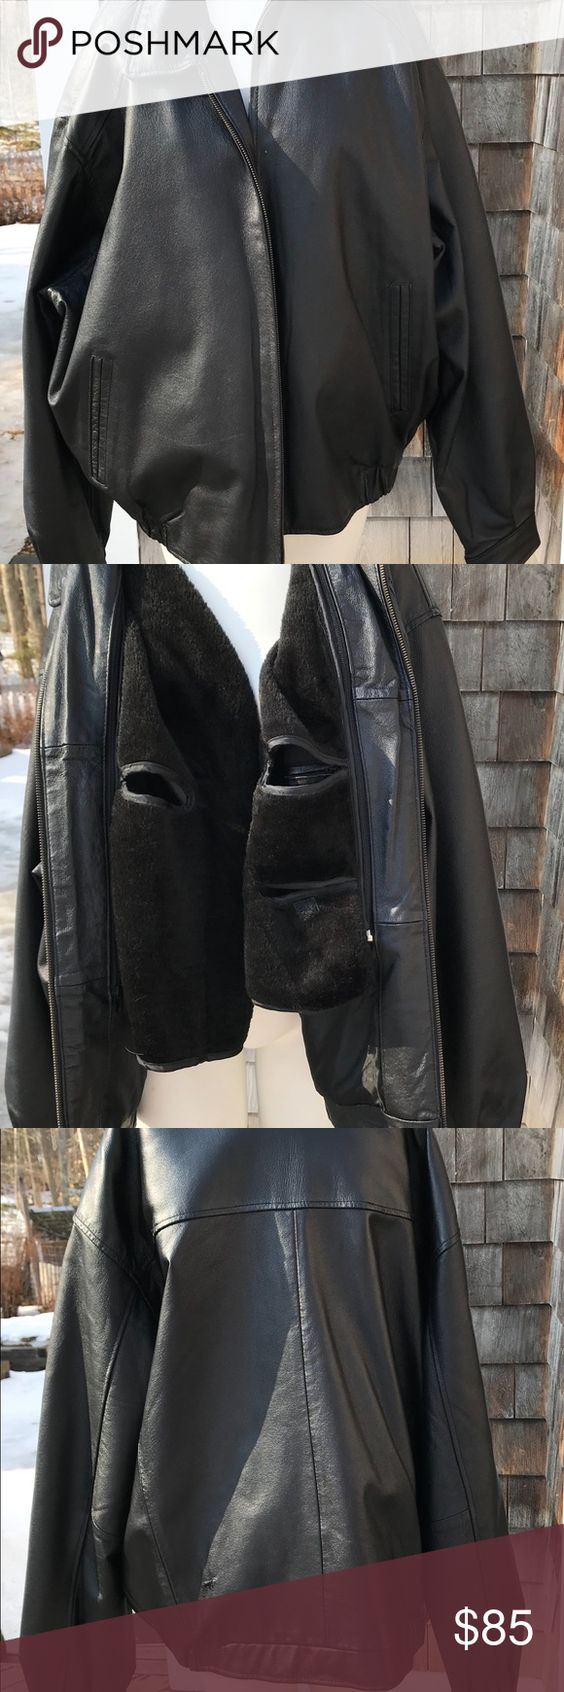 Leather Jacket Leather Jacket Jackets Leather [ 1692 x 564 Pixel ]